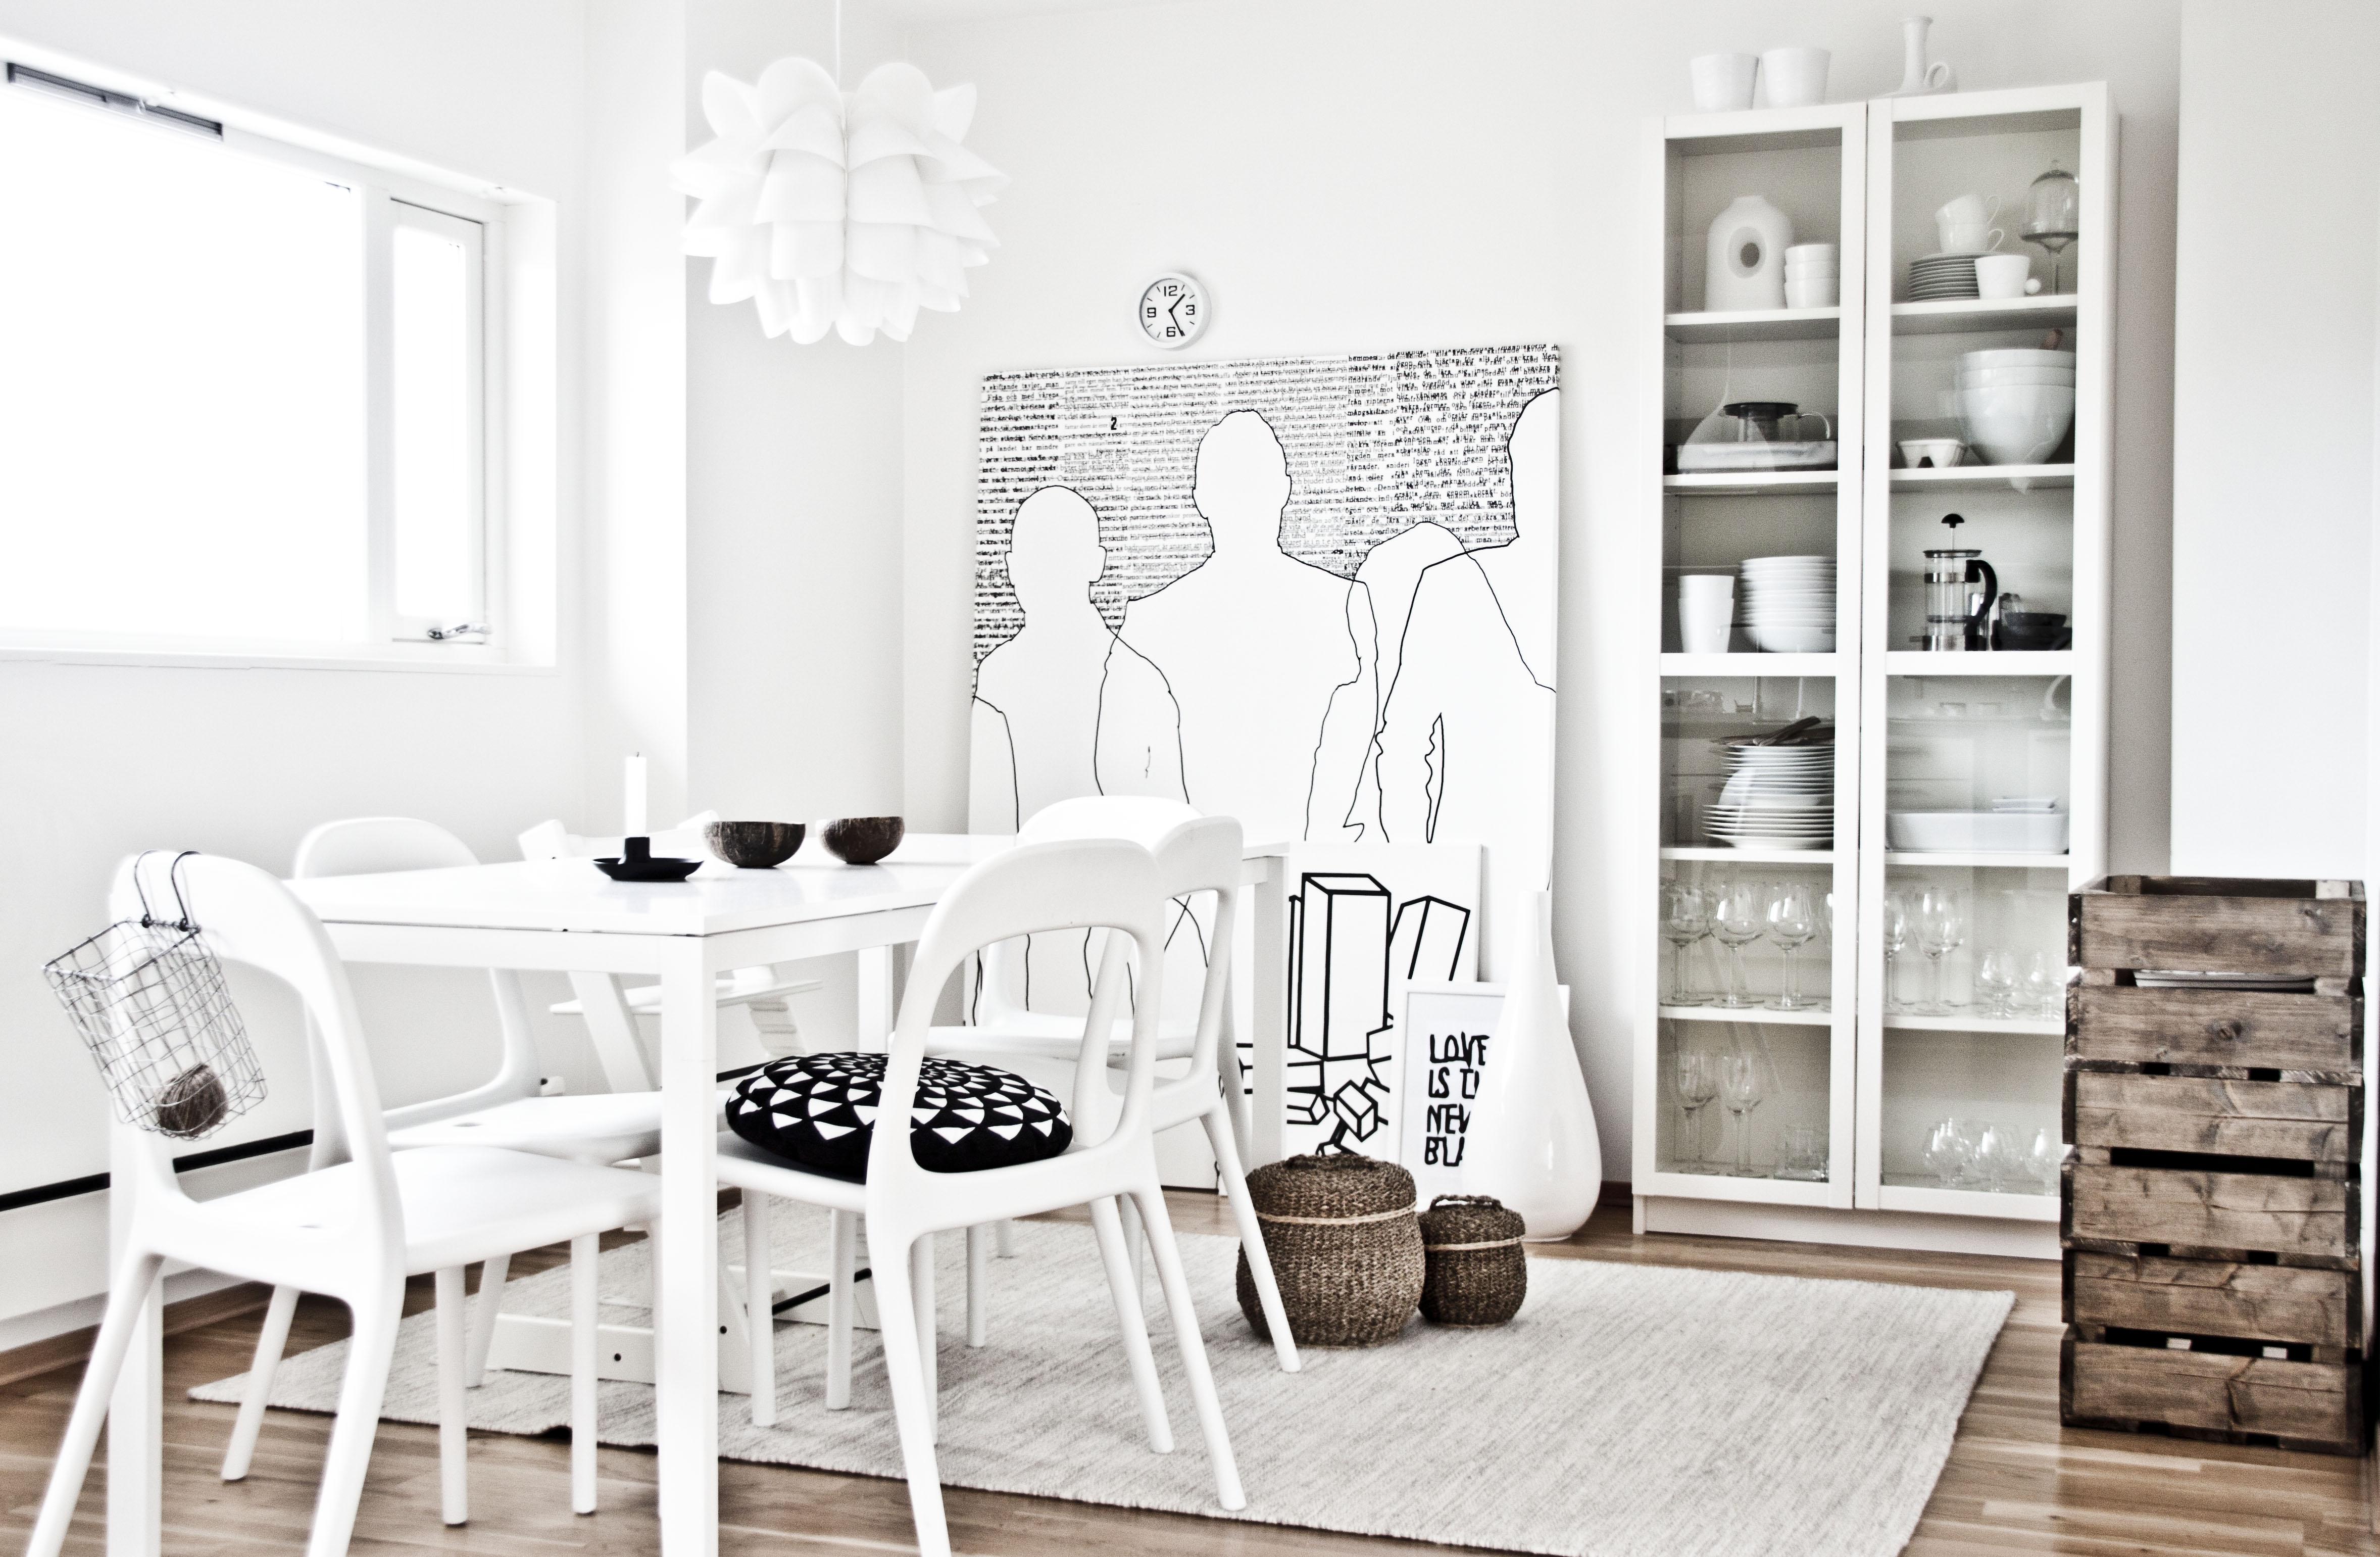 REGINES HOME - Dekolehti.fi